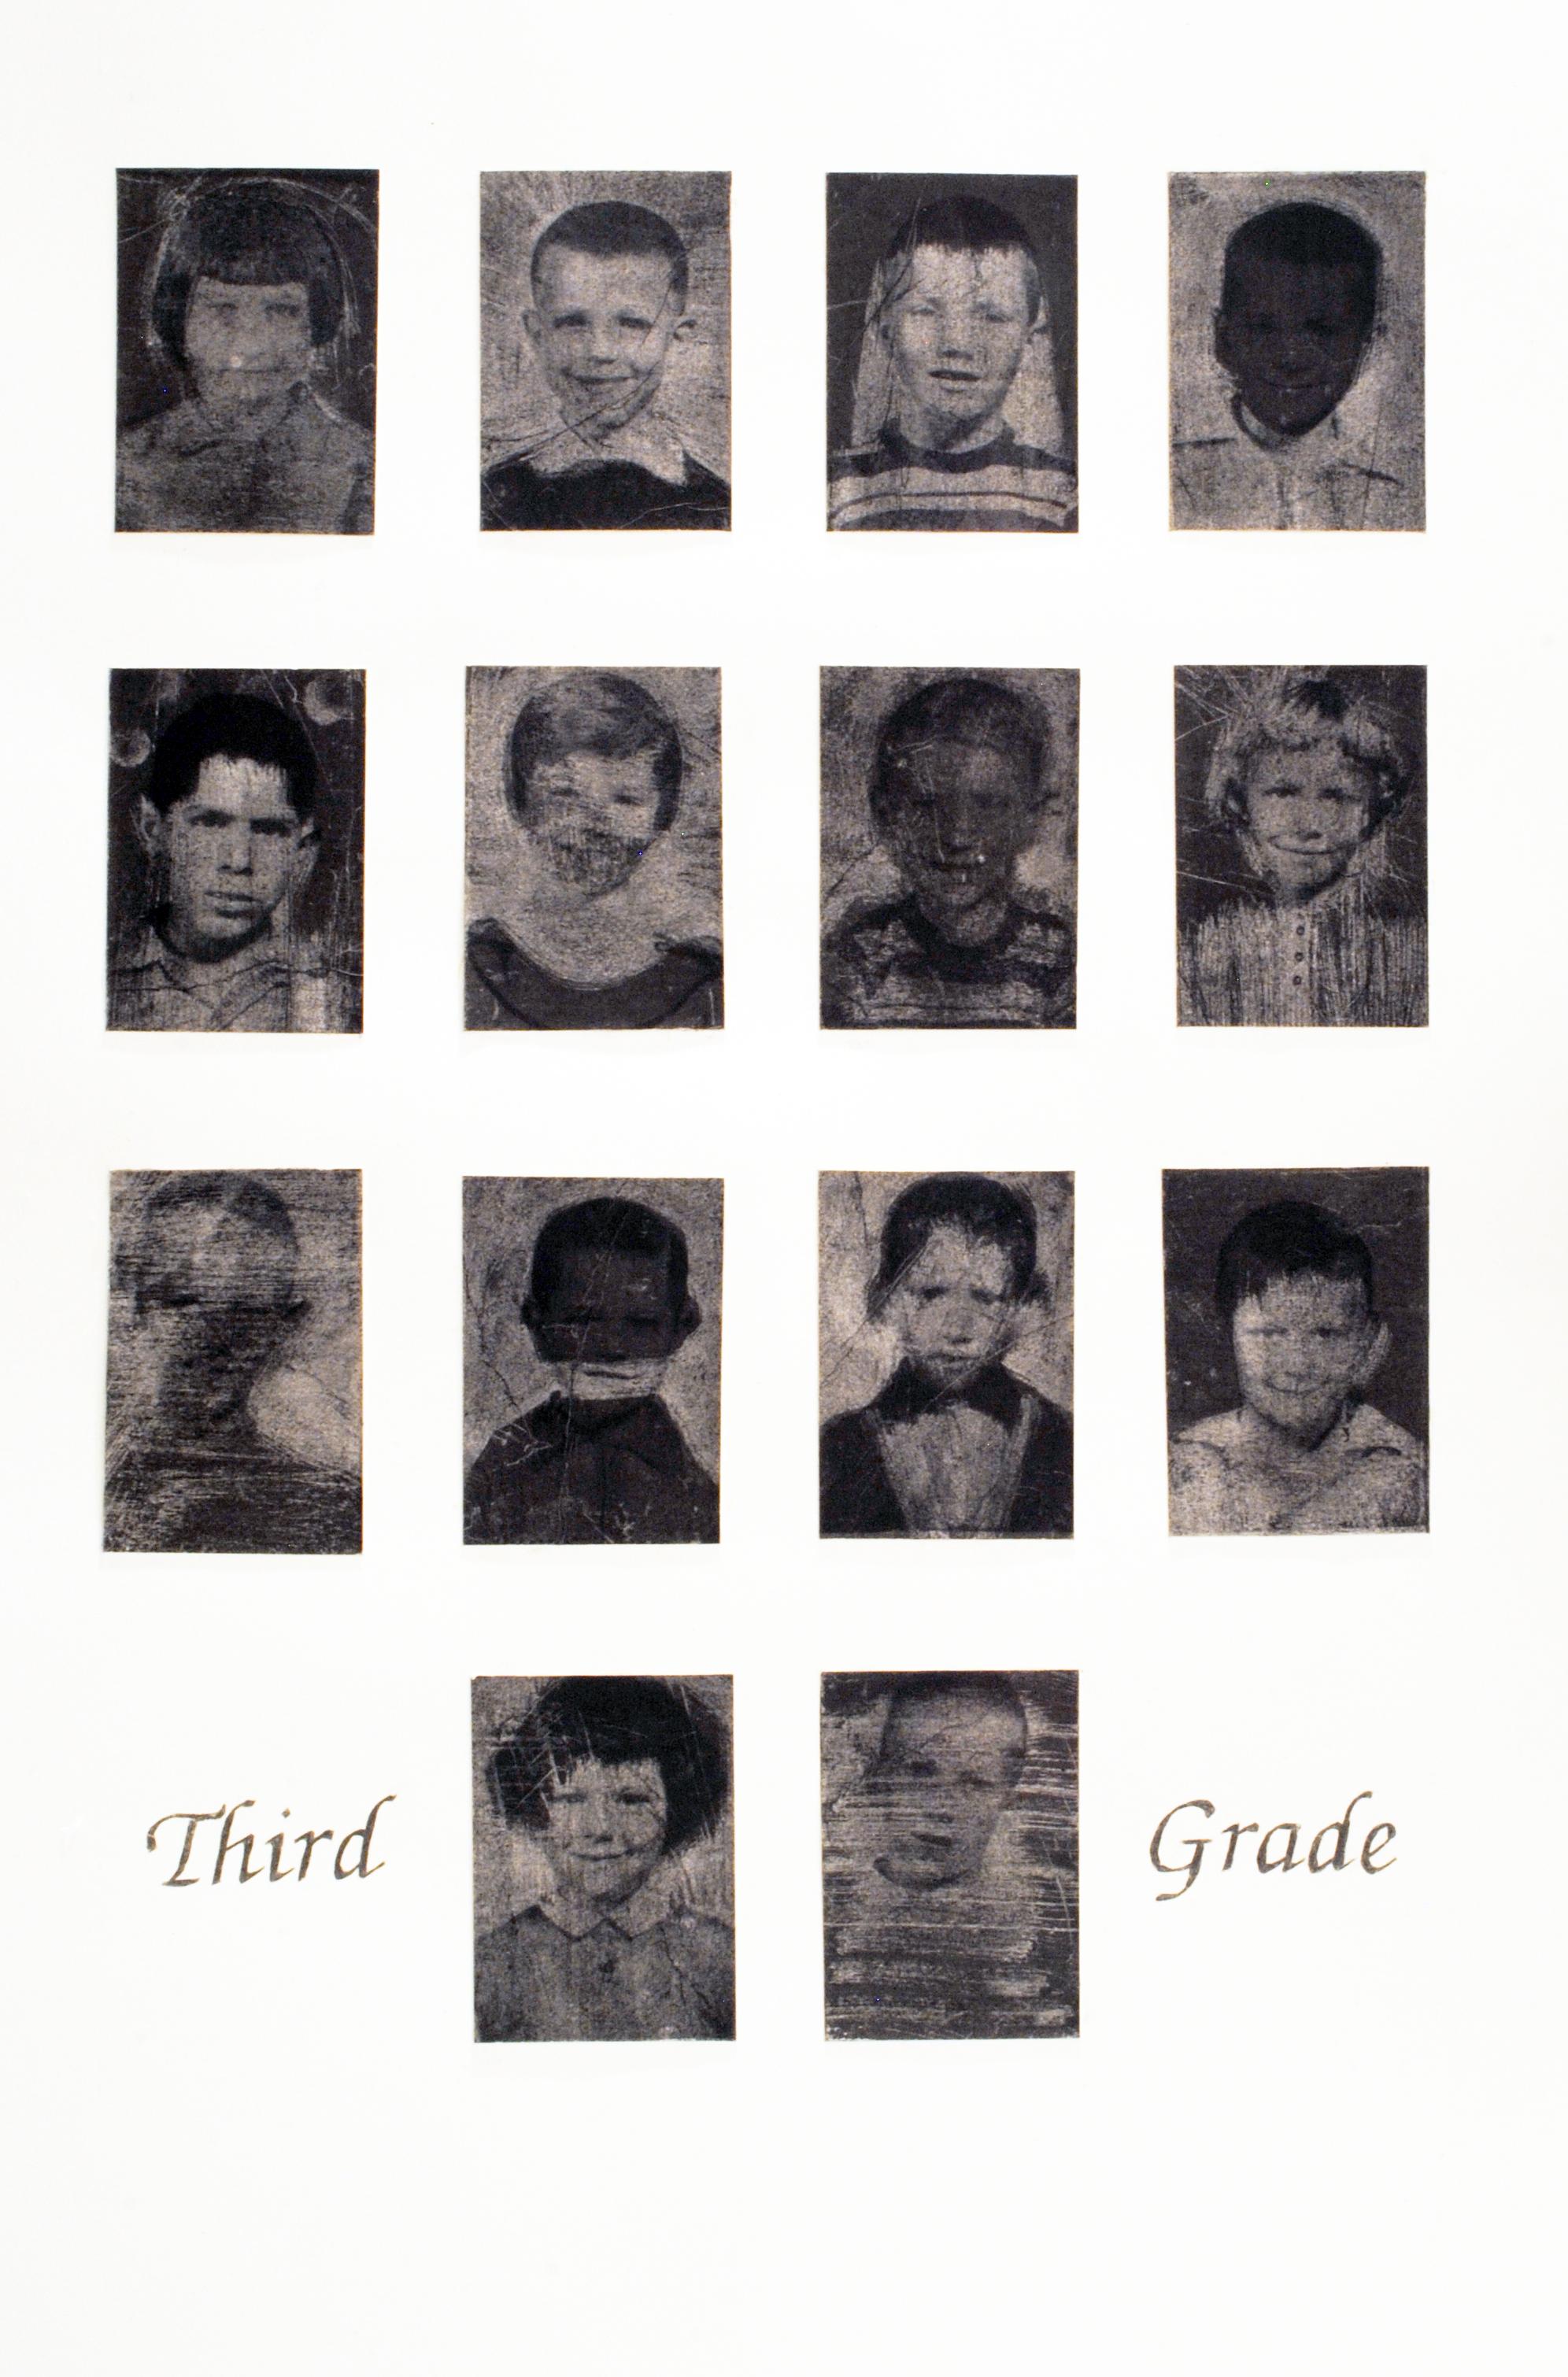 Third Grade (O Children # 00040)